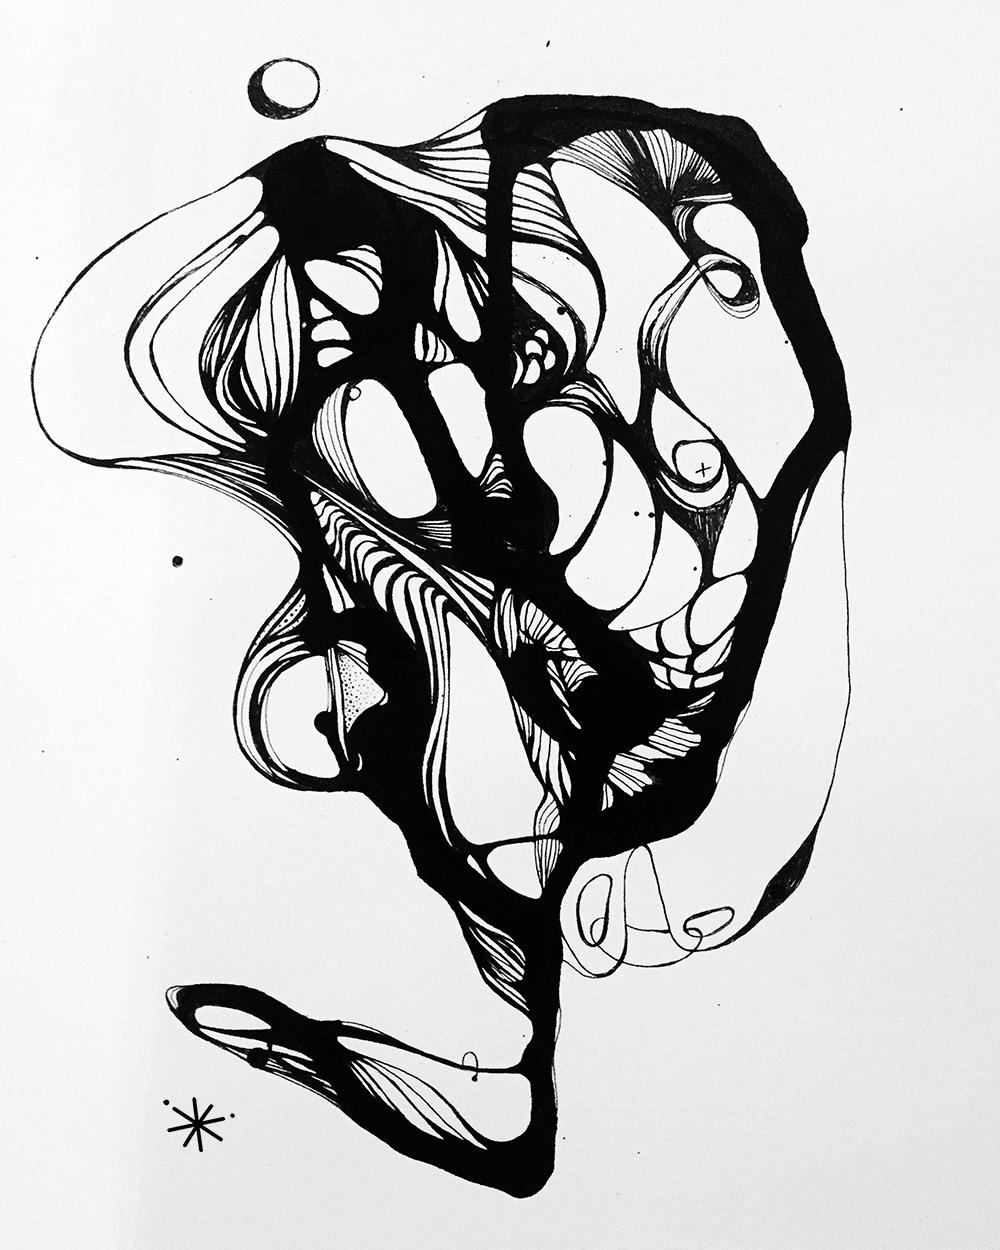 horse head - 2017 Ink marker pa - berenice_rosie | ello